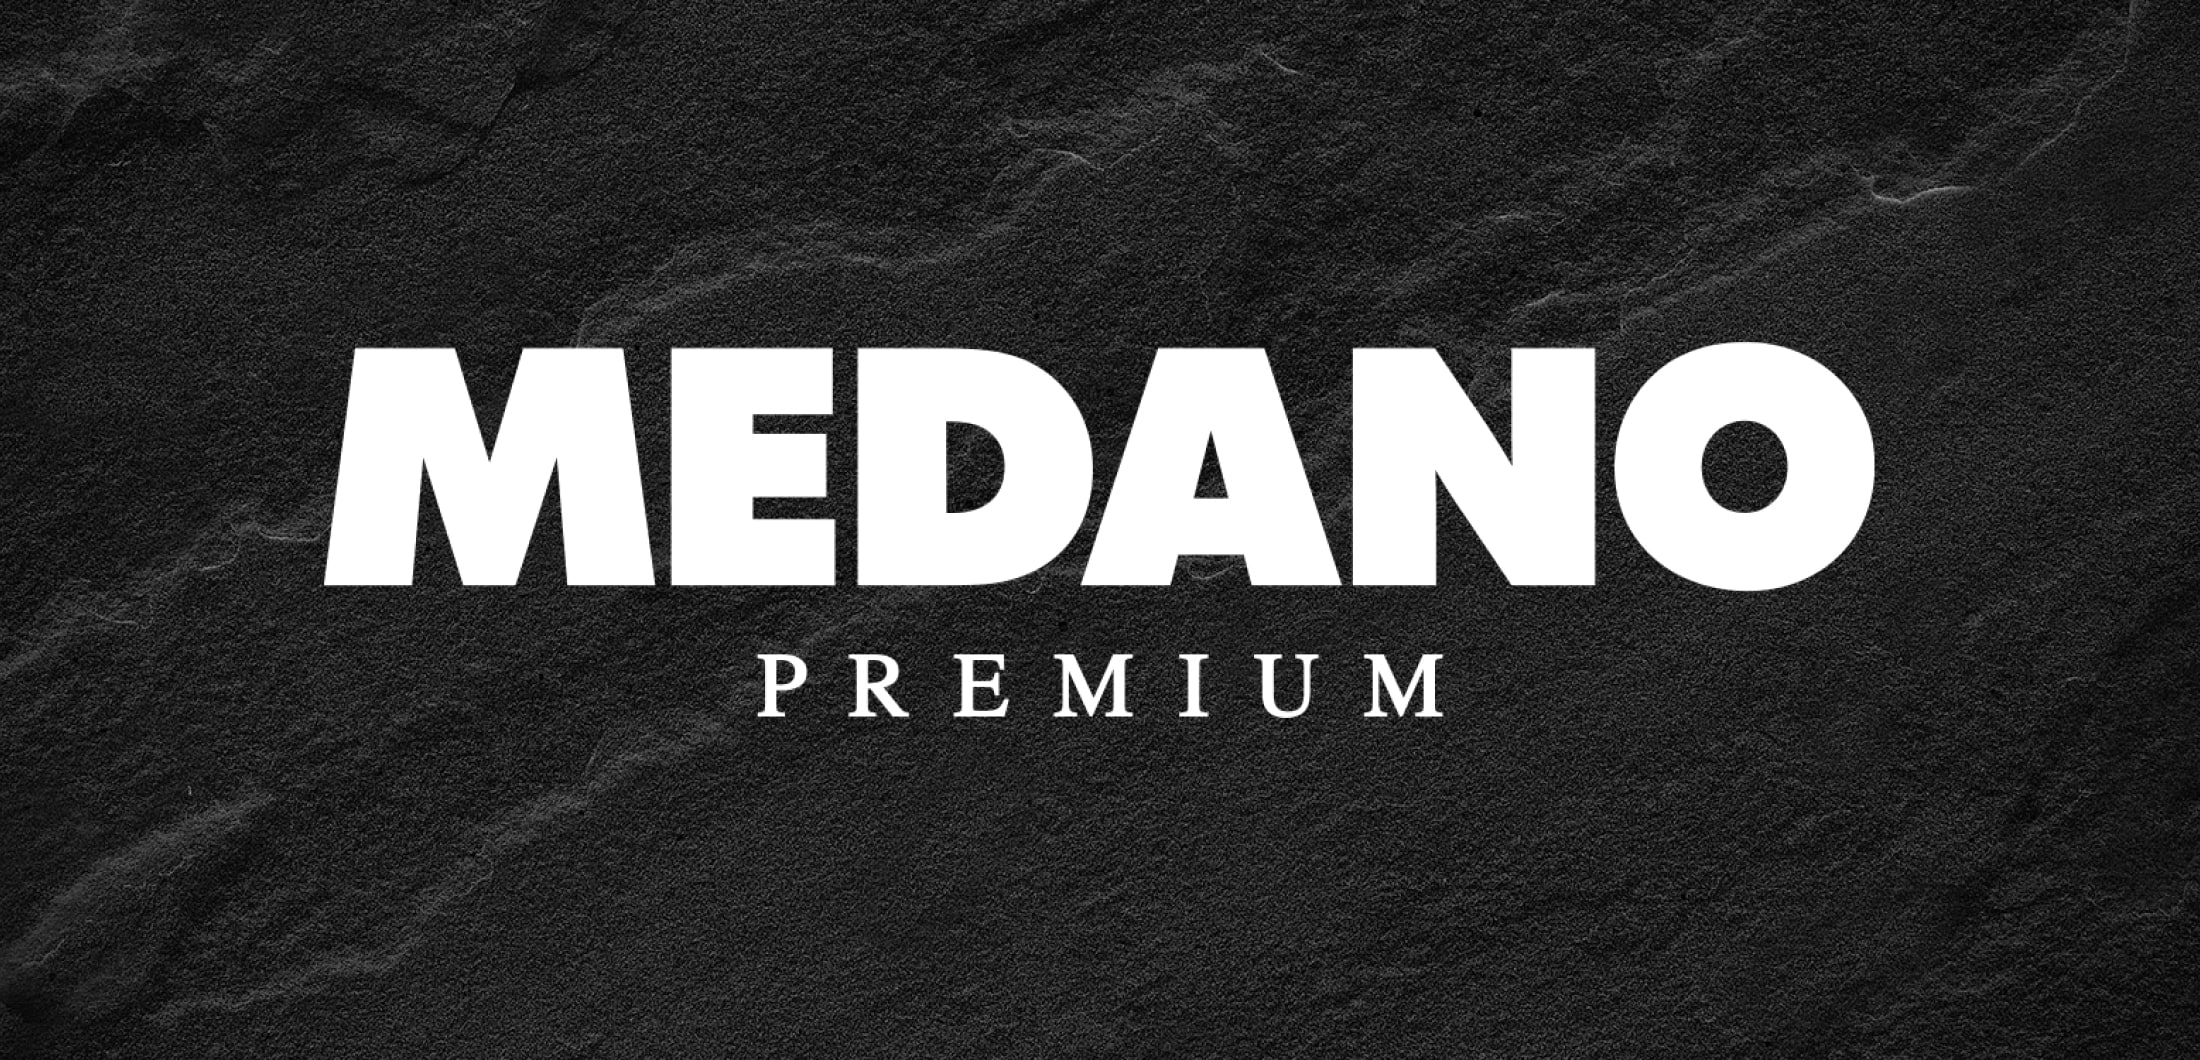 medano_premium-02-desktop